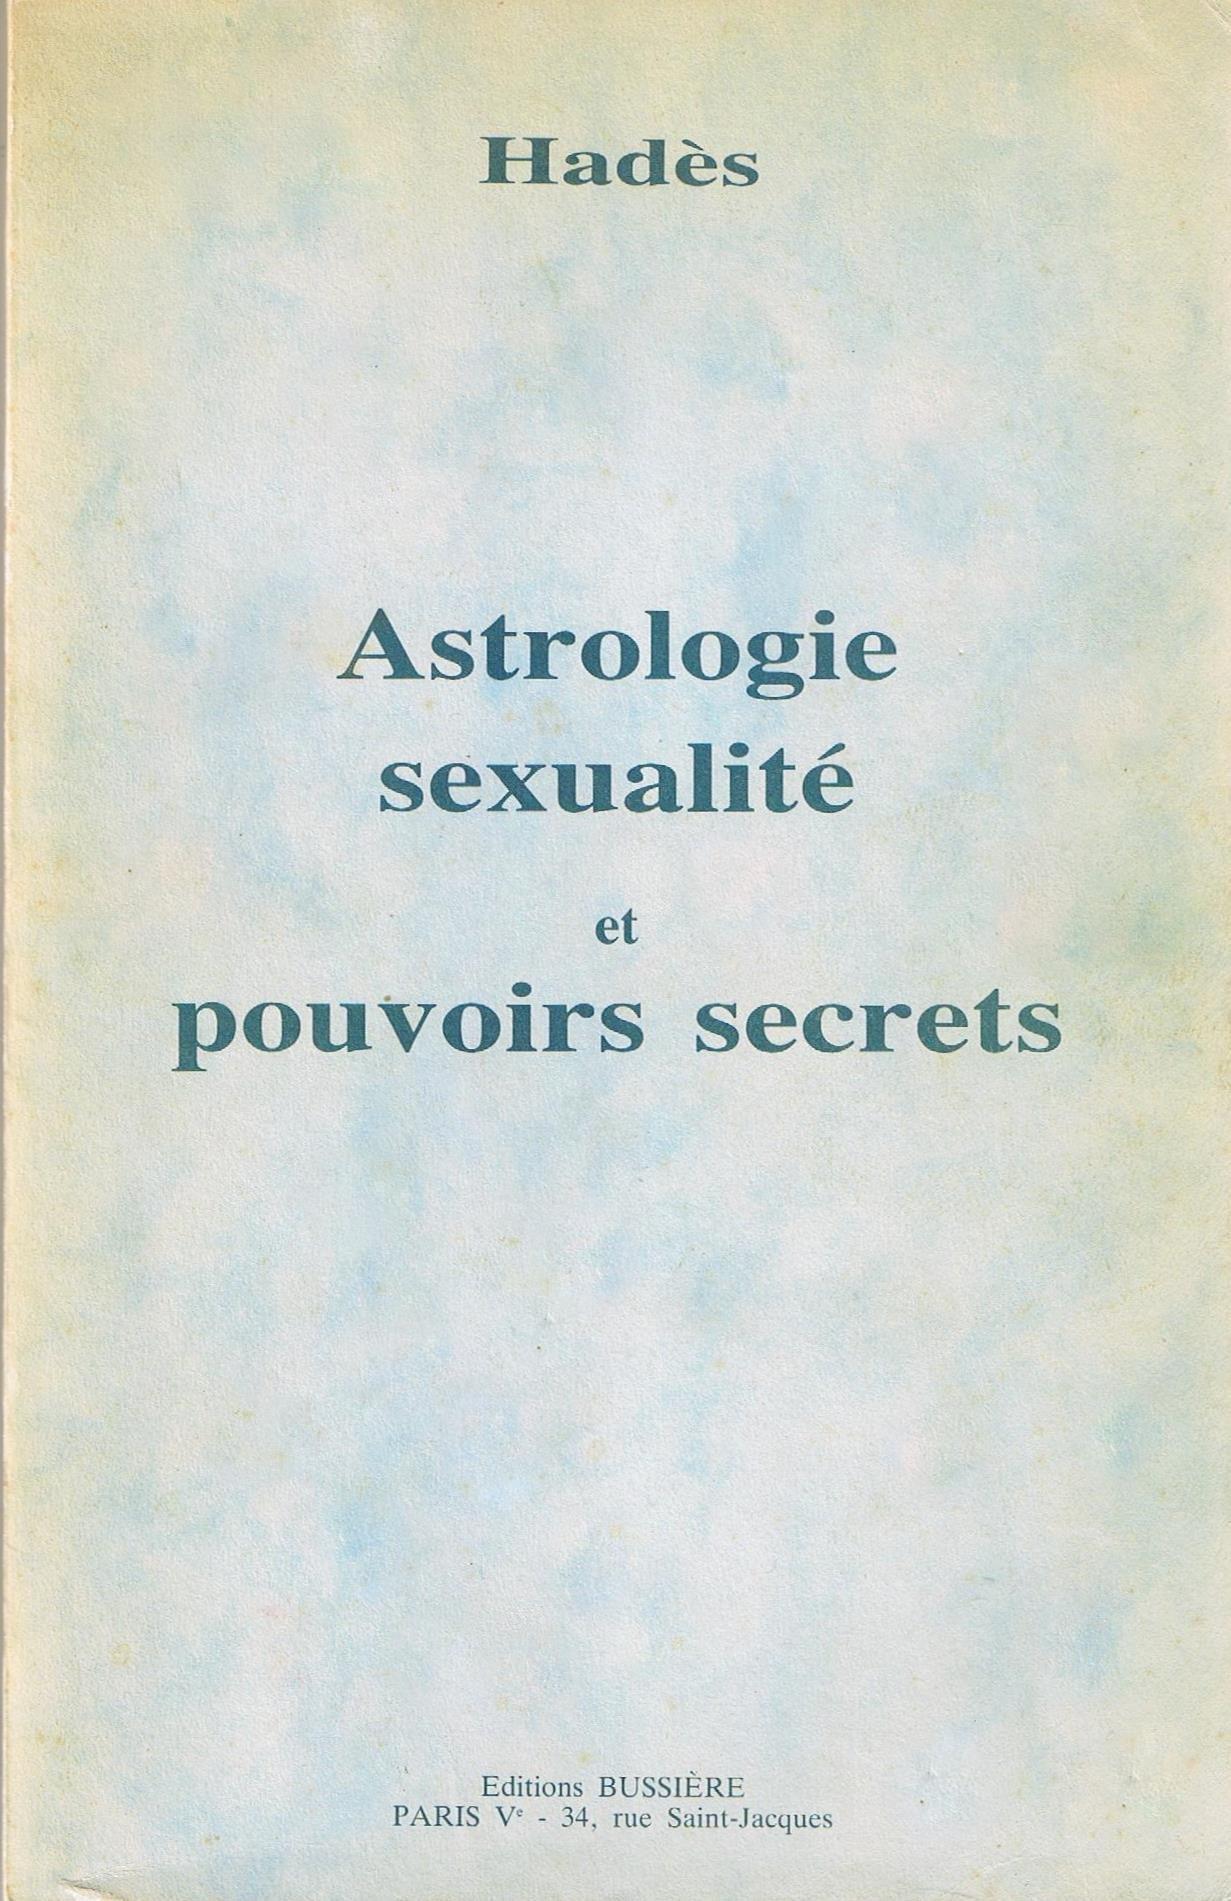 astrologie sexuelle